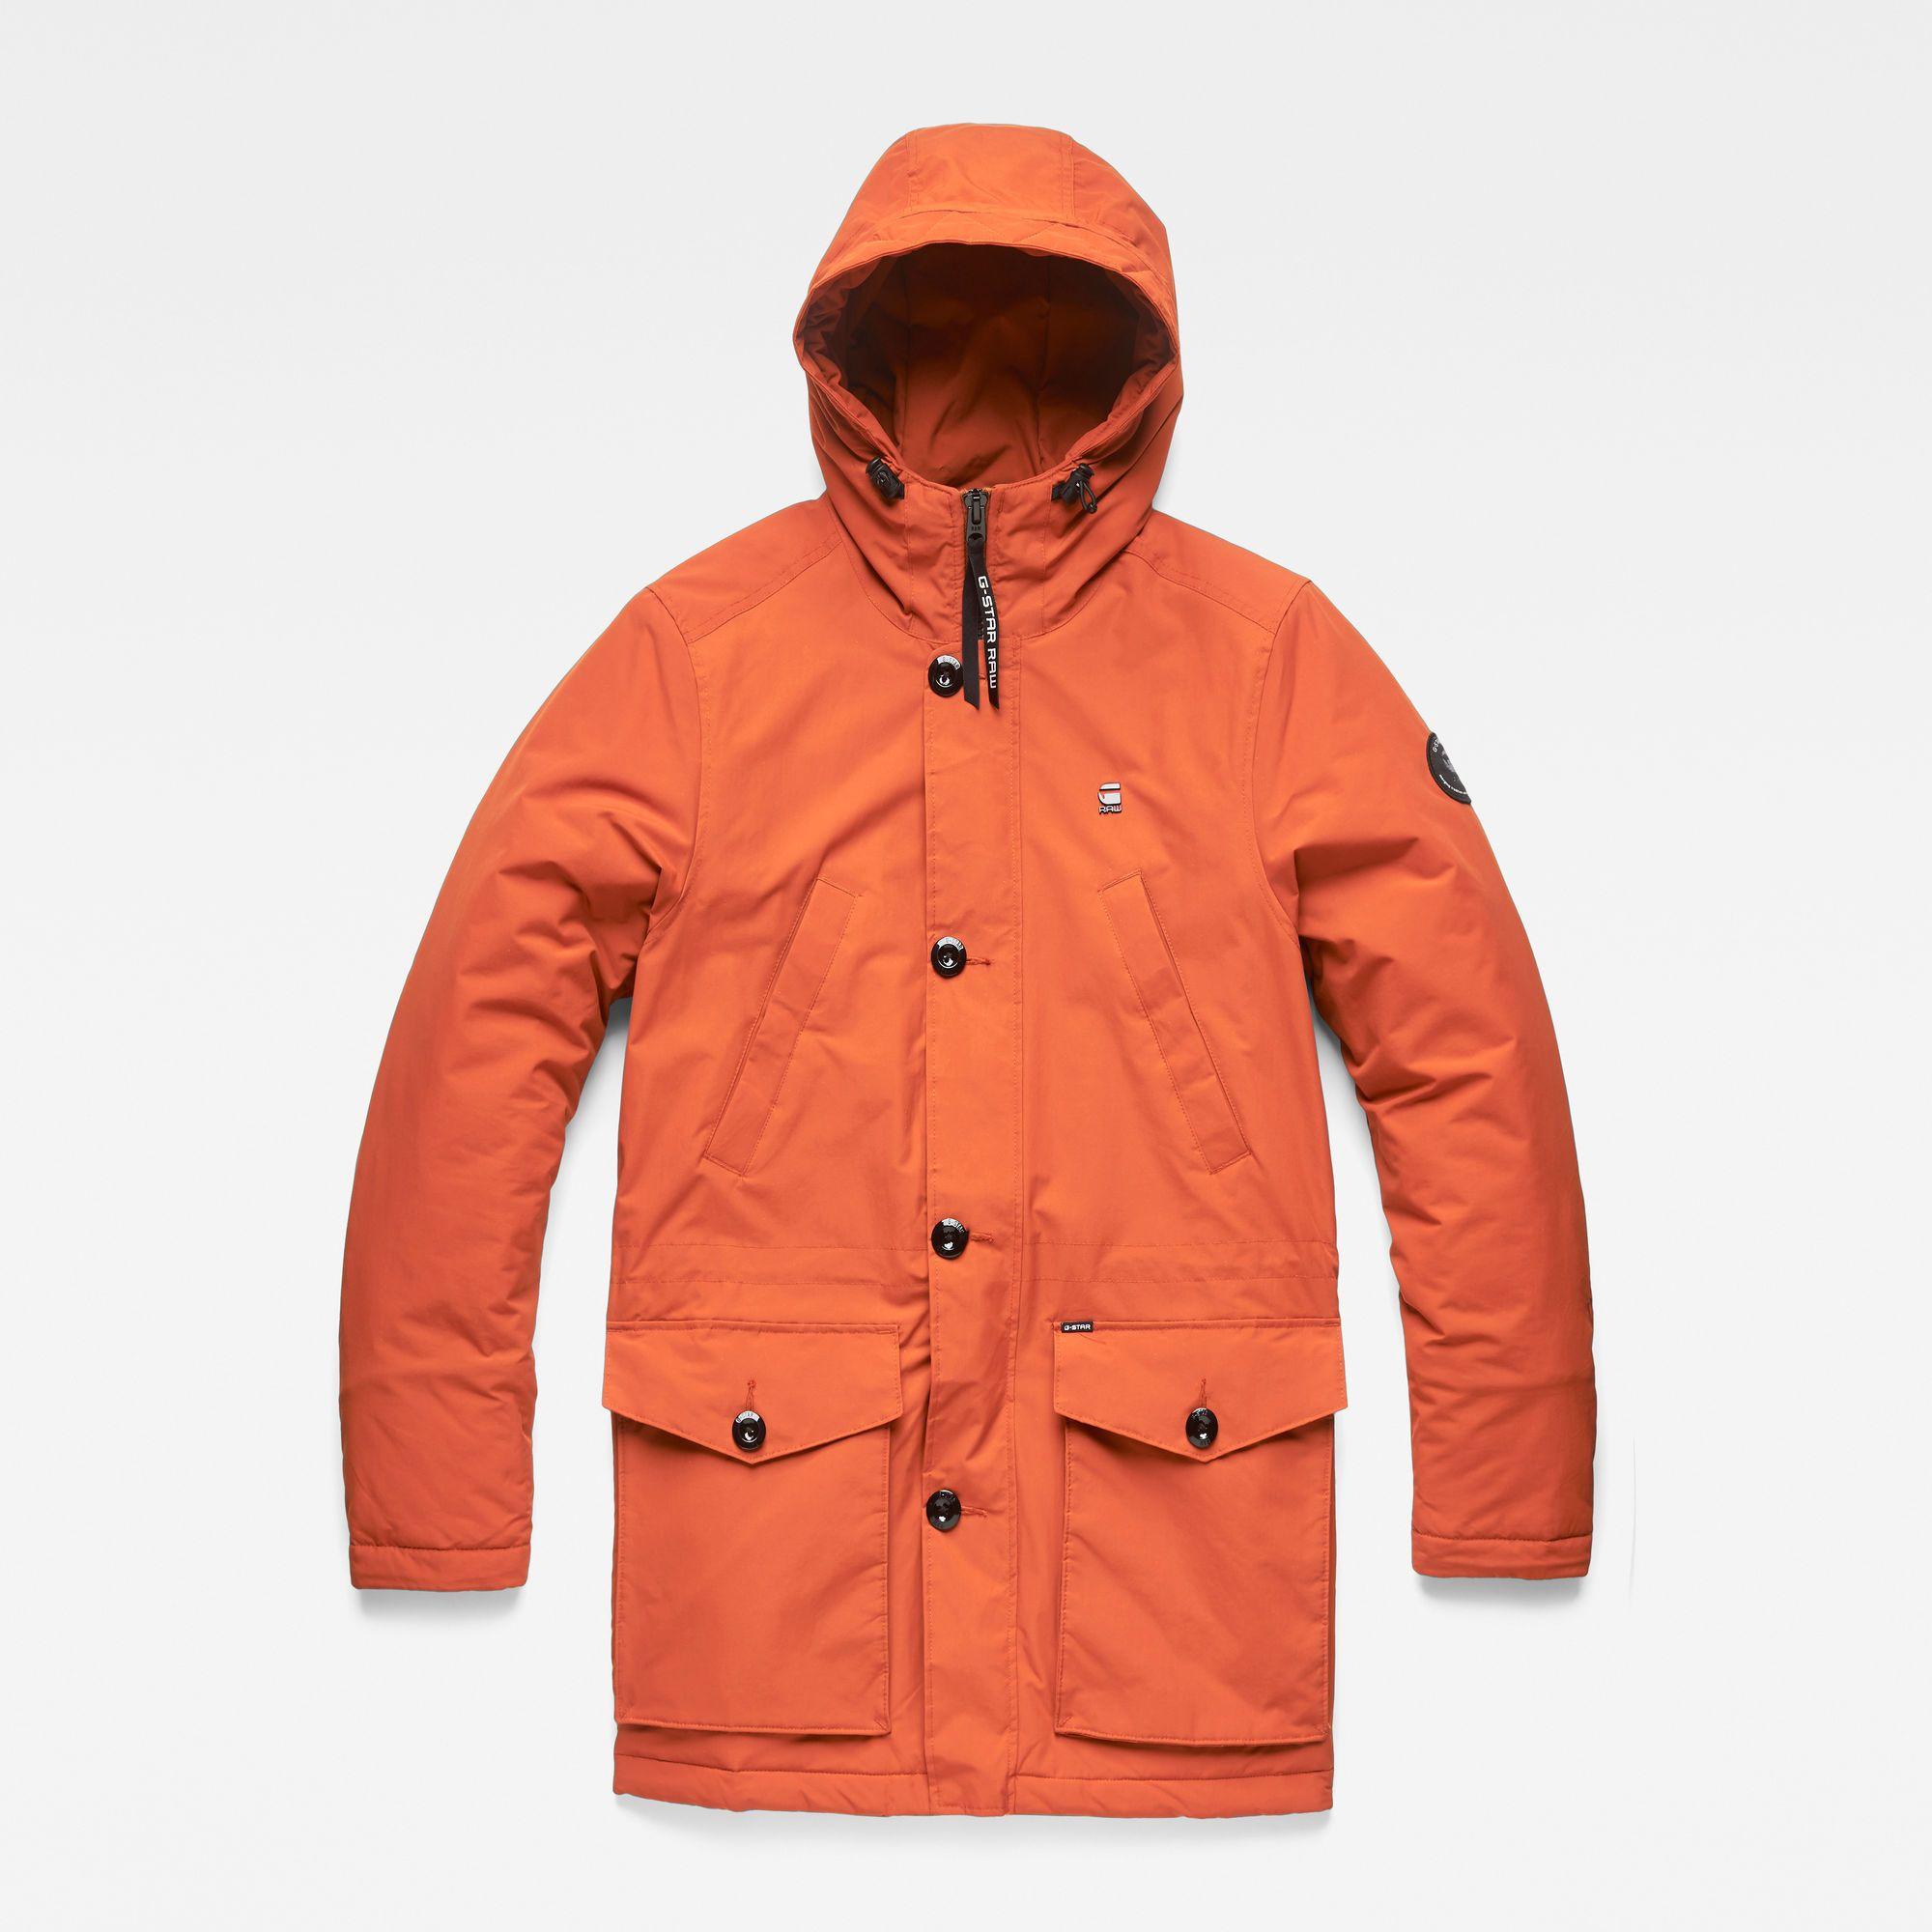 Vodan Padded Parka | Raw clothing, Parka, Denim branding